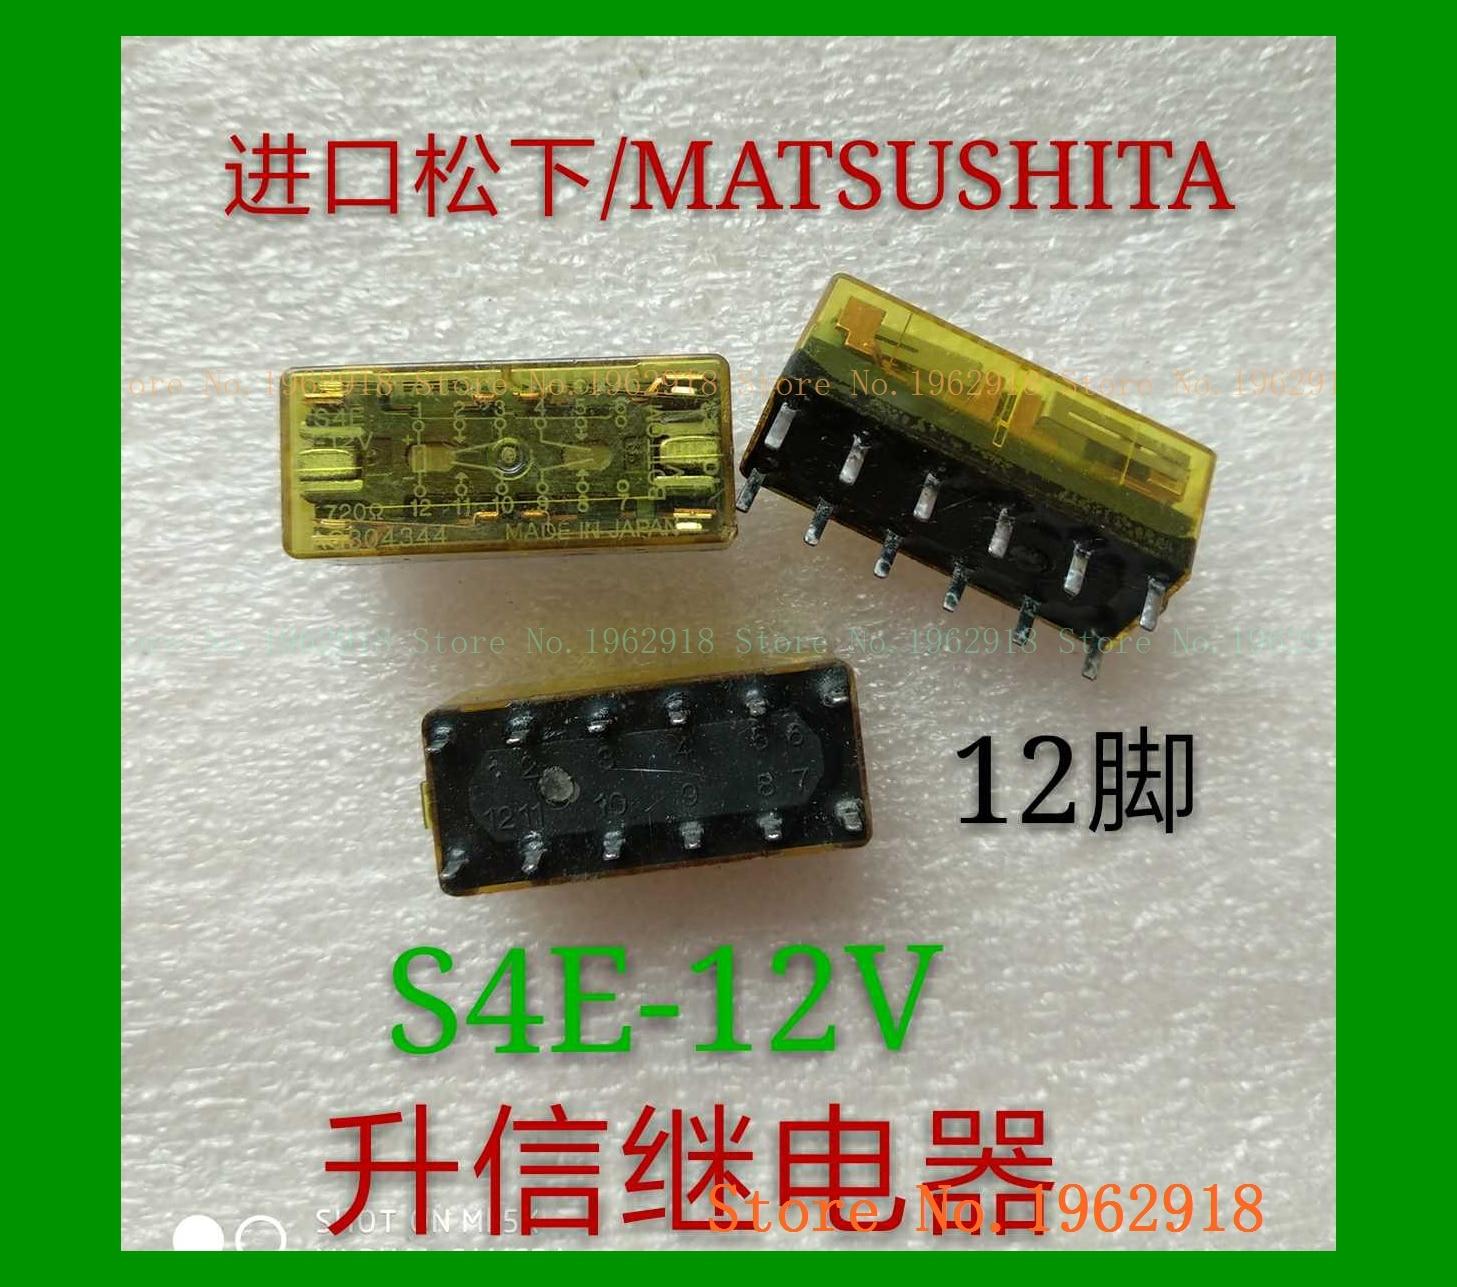 S4E-12V 12